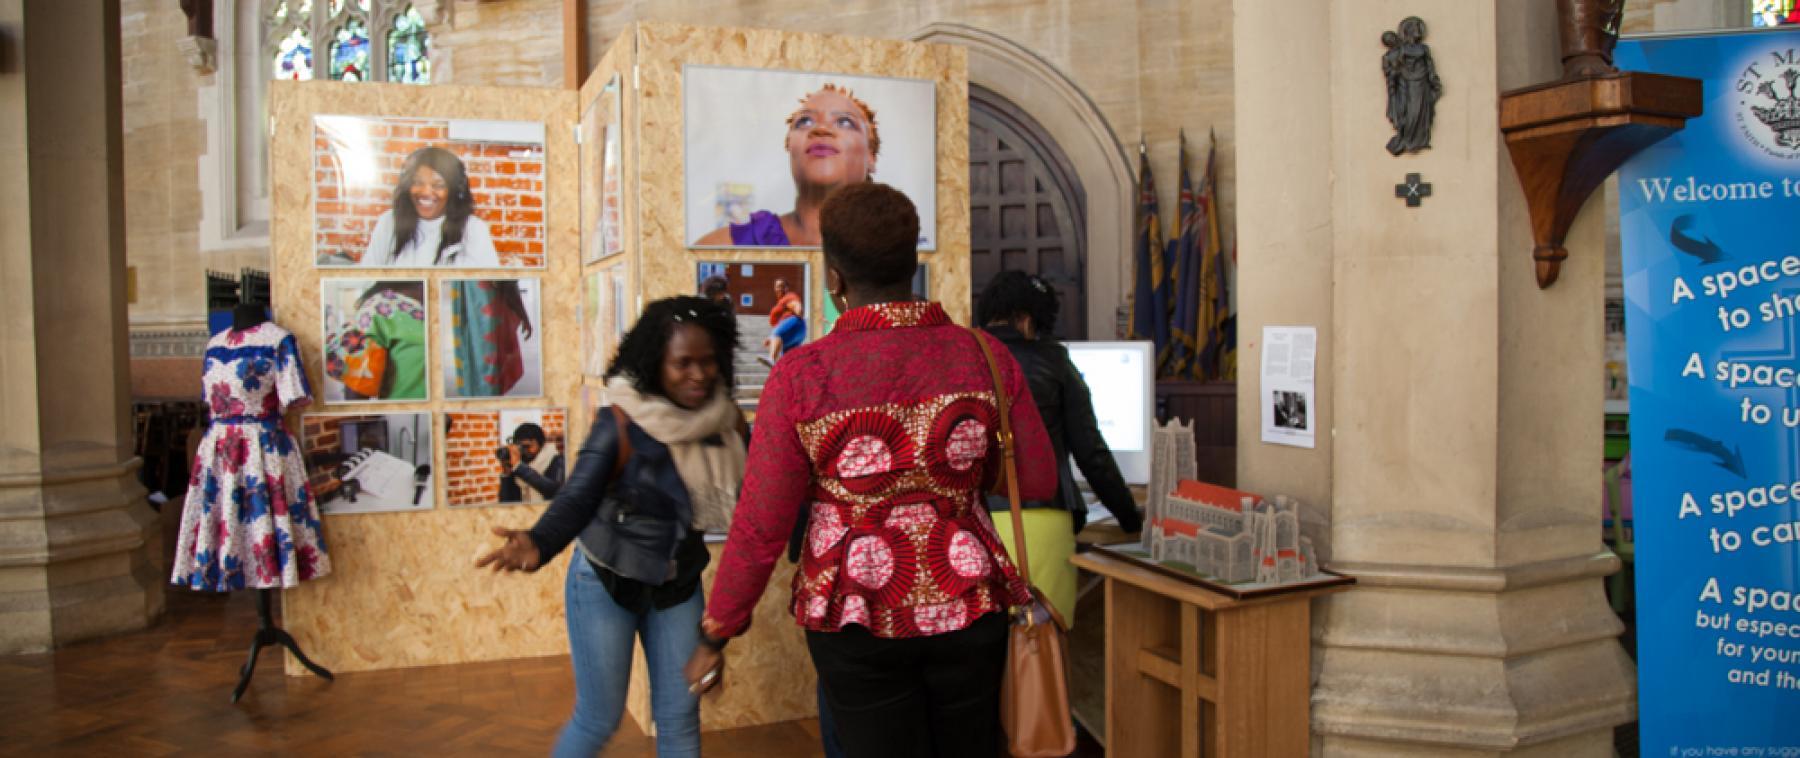 Aspex digital arts workshop participants view their works